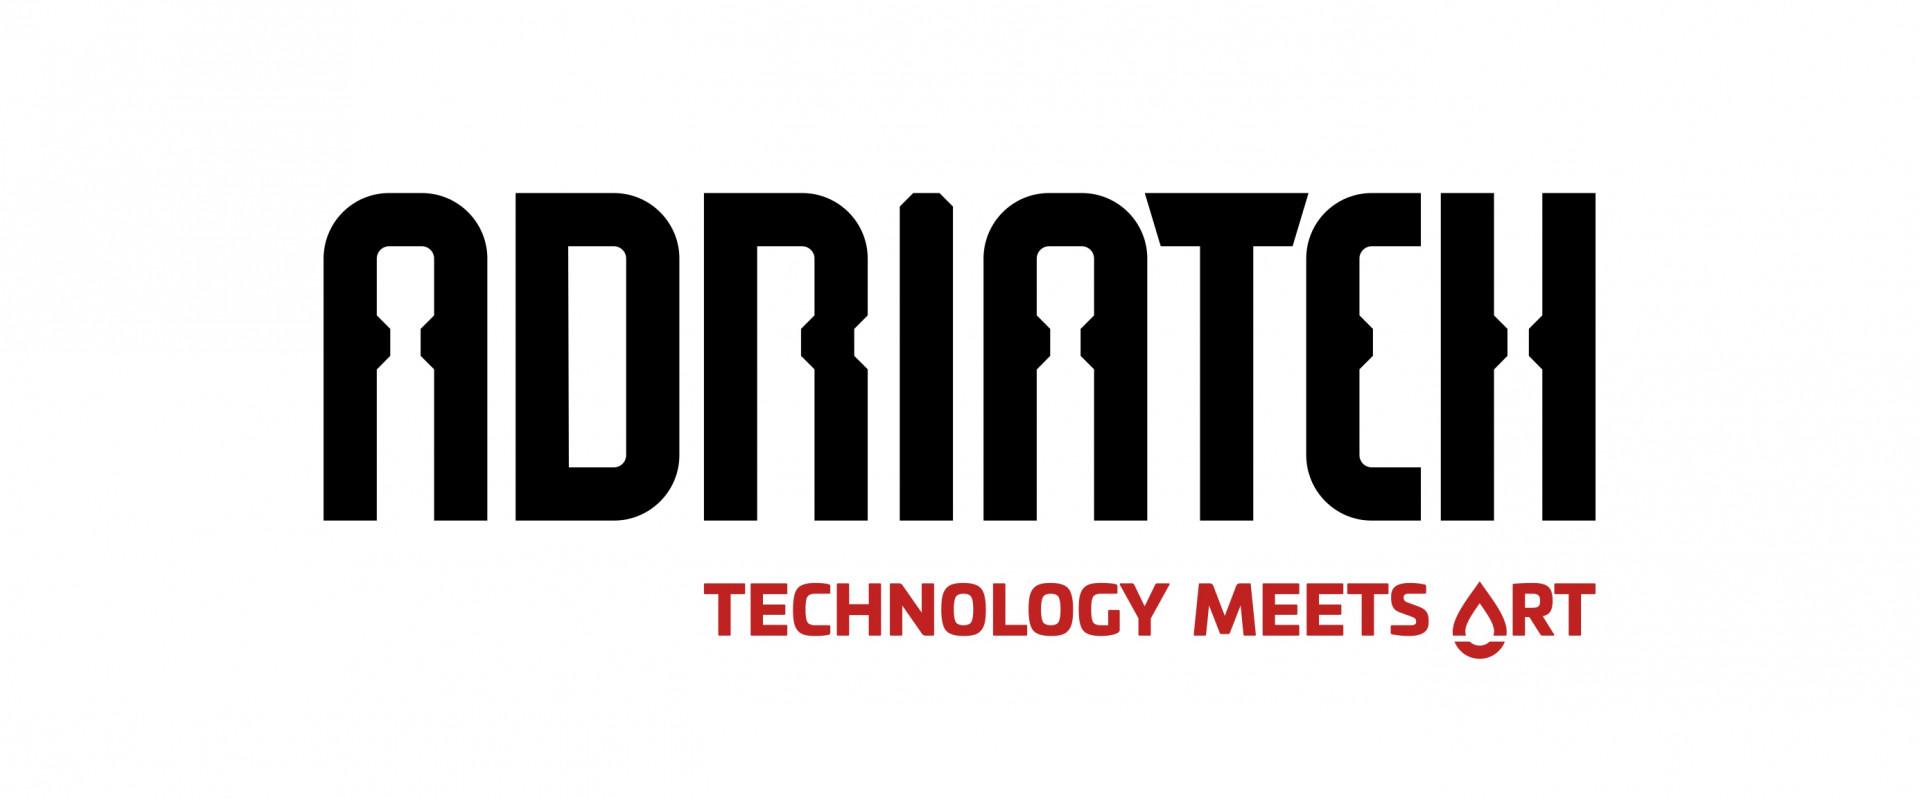 Adriateh logo 2017 convert.jpg